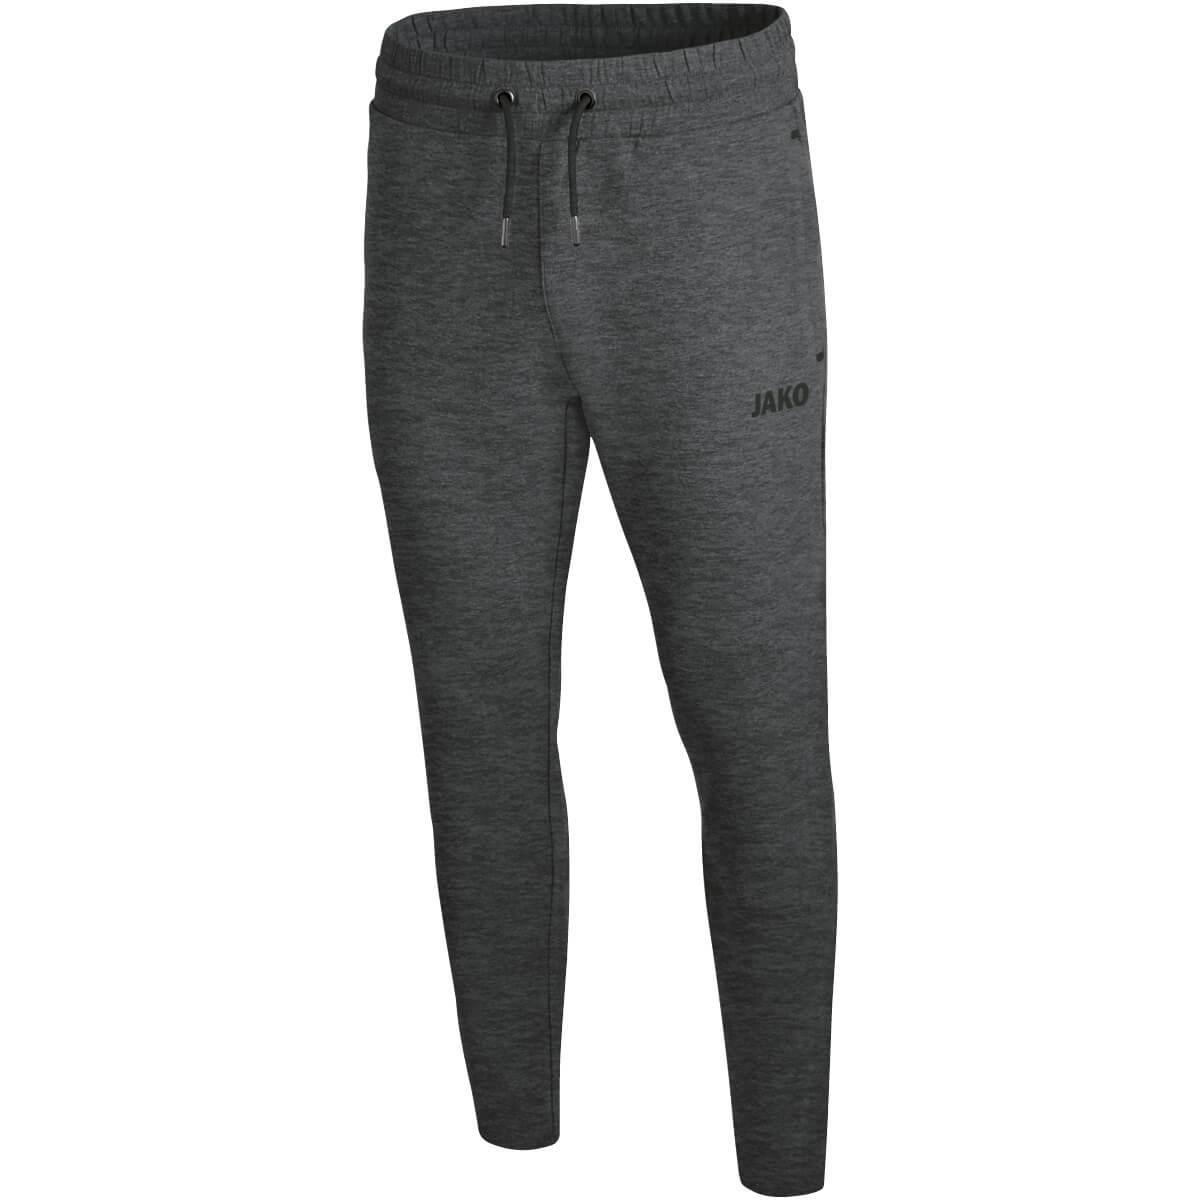 Jogginghose Premium Basics - Frauen | Jako 8429